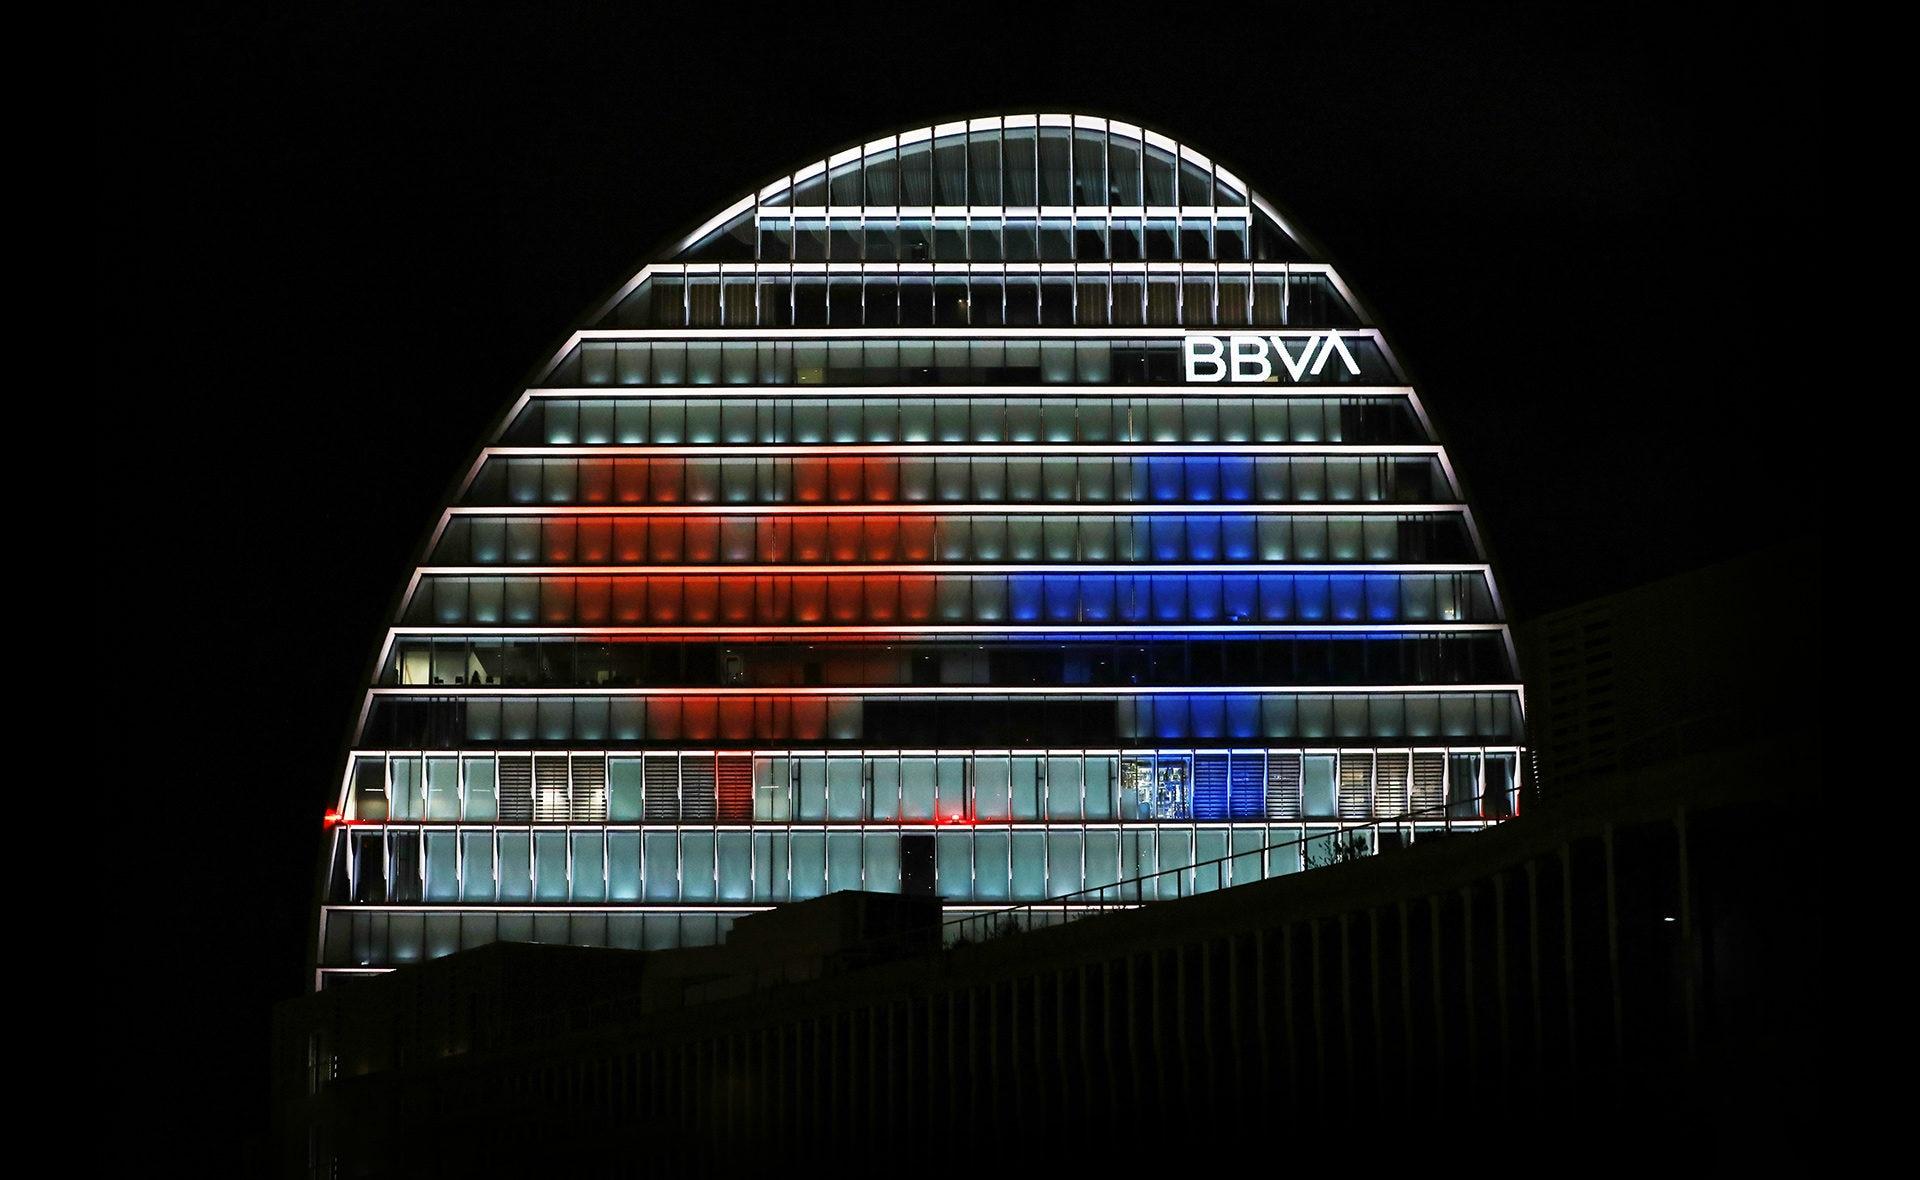 La Vela _Coronavirus_se ilumina_BBVA_Pandemia_solidaridad